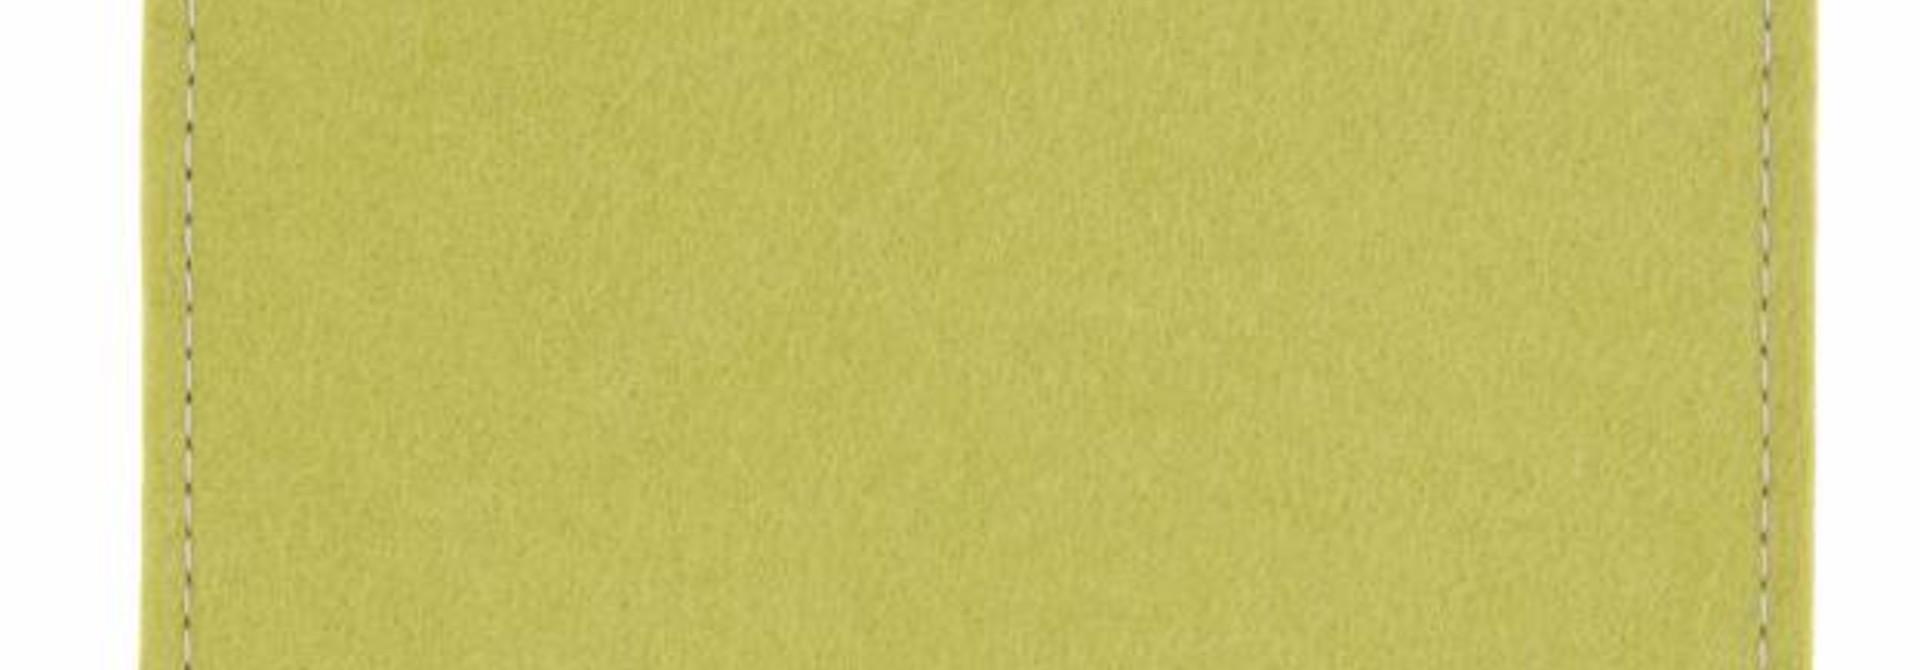 Sleeve Lime-Green